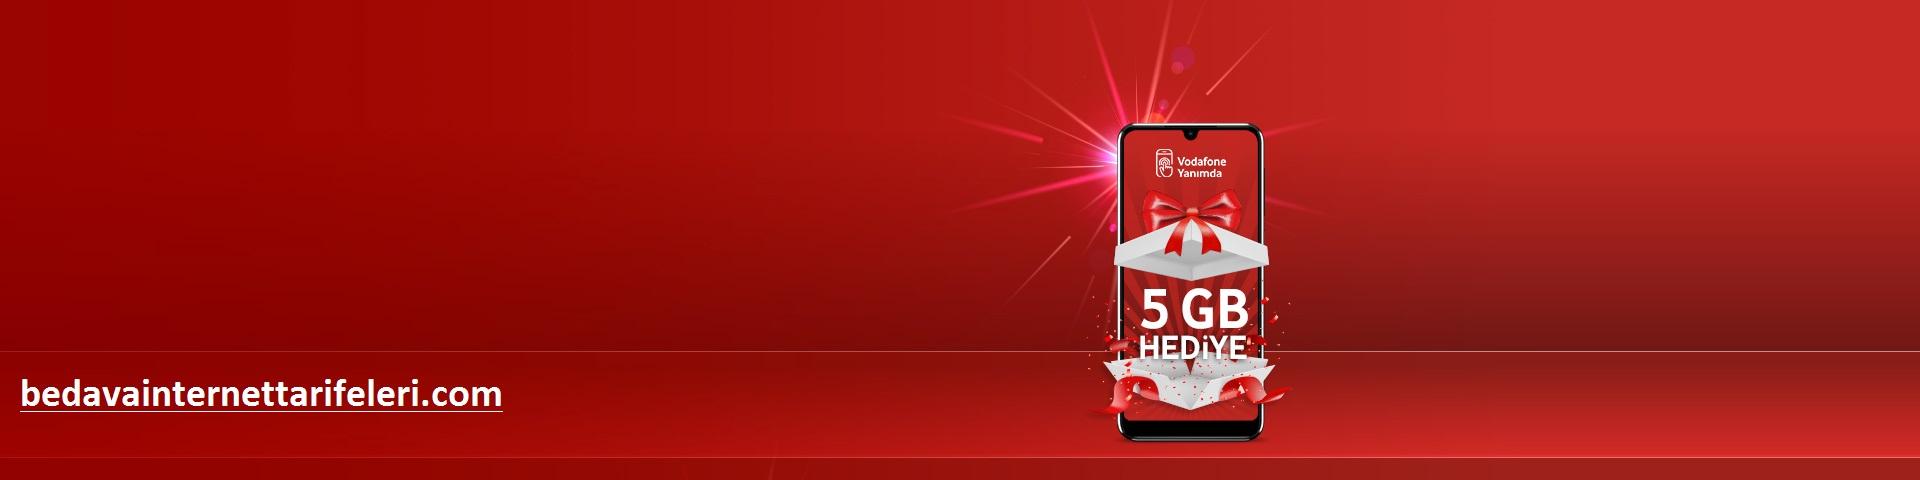 Vodafone 4.5 G Hediye İnternet